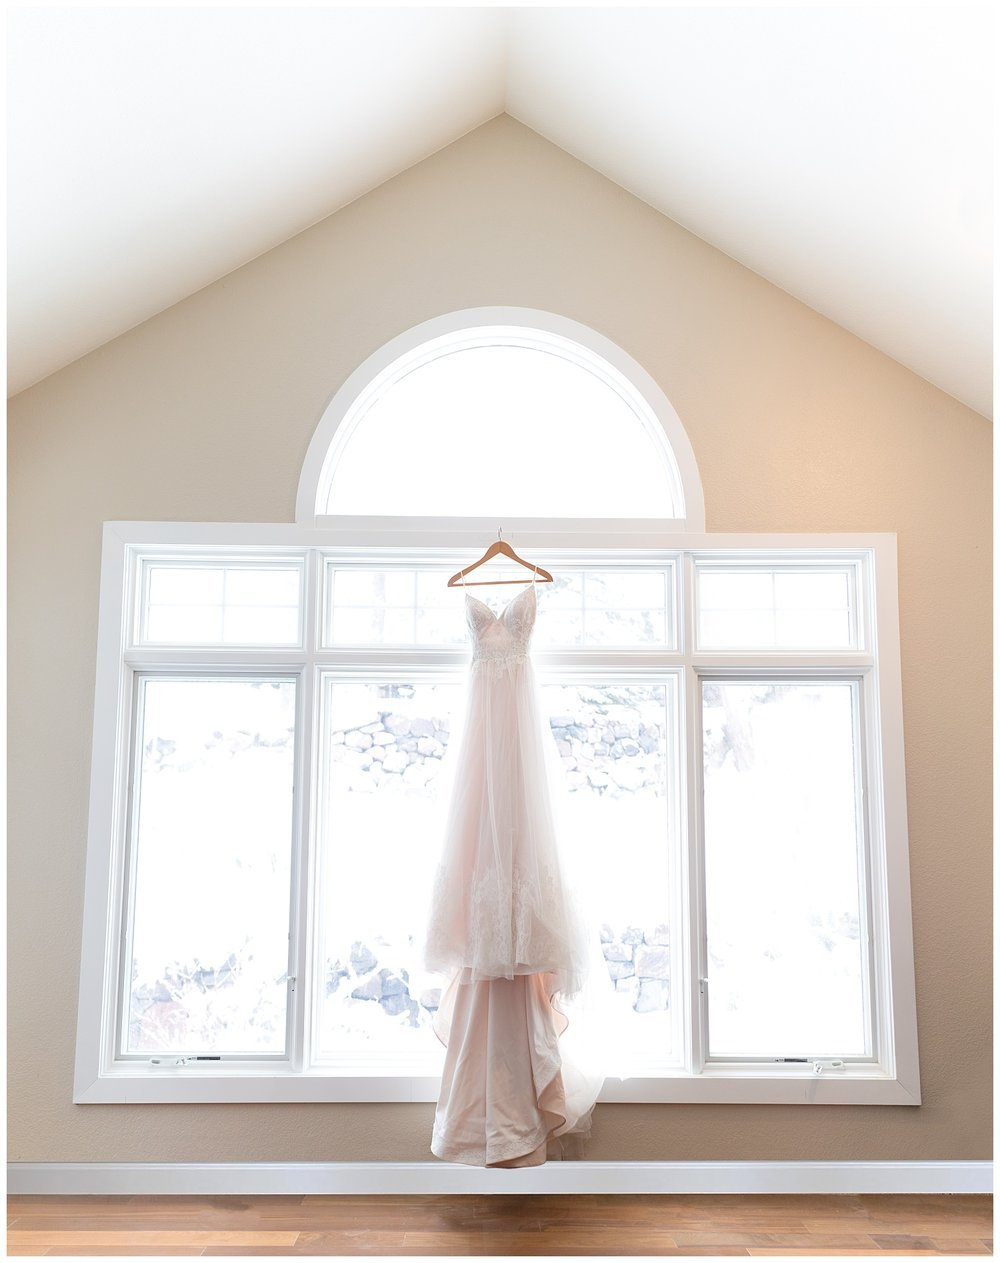 Wedding dress hanging in a brightly lit window